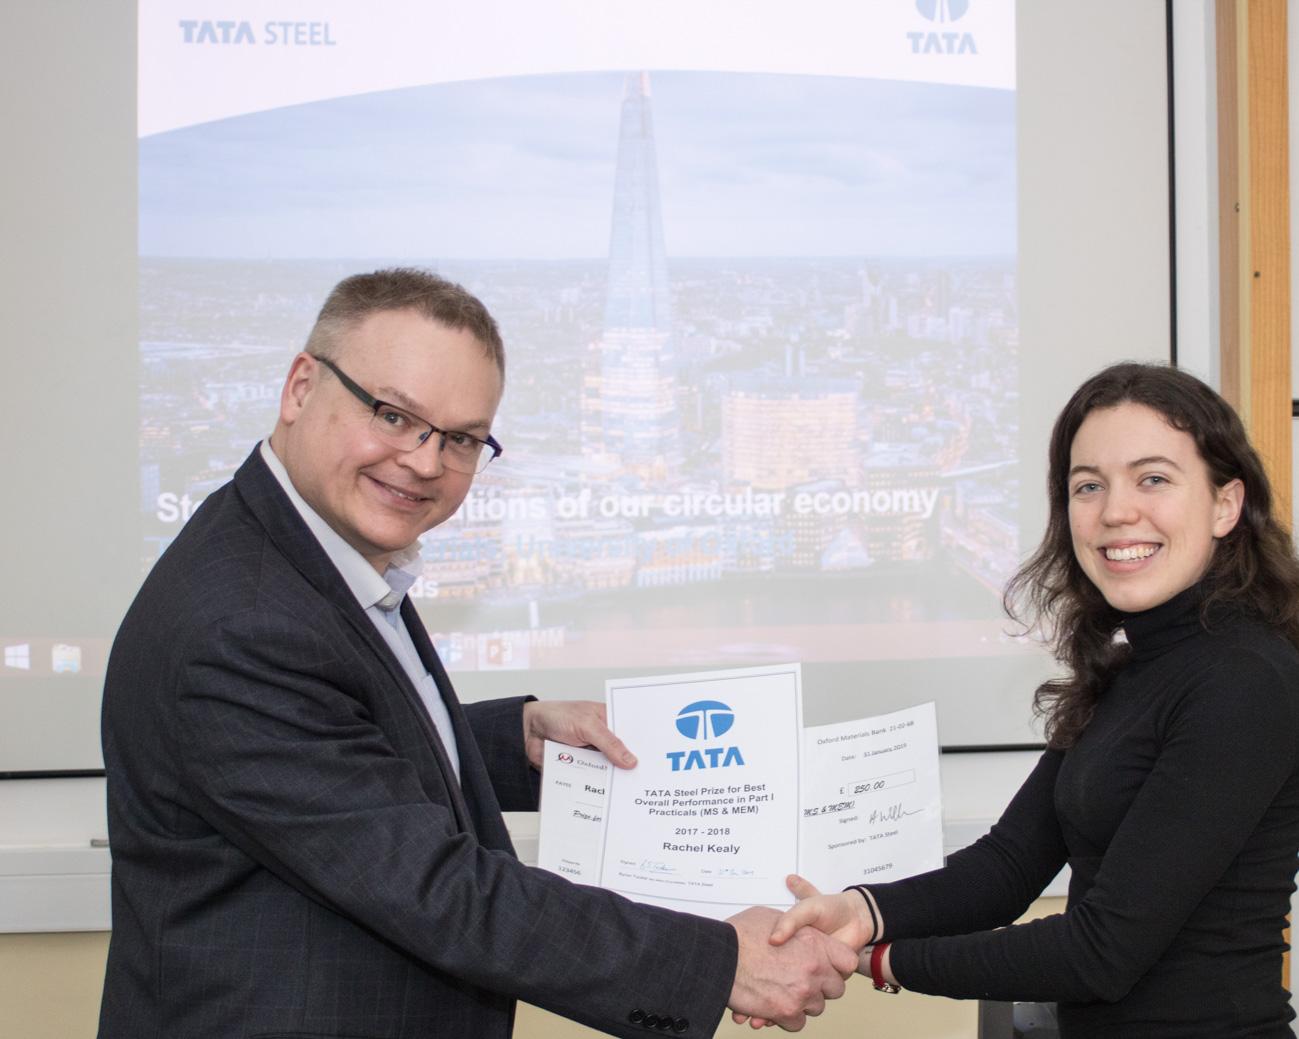 TATA Prize 2019